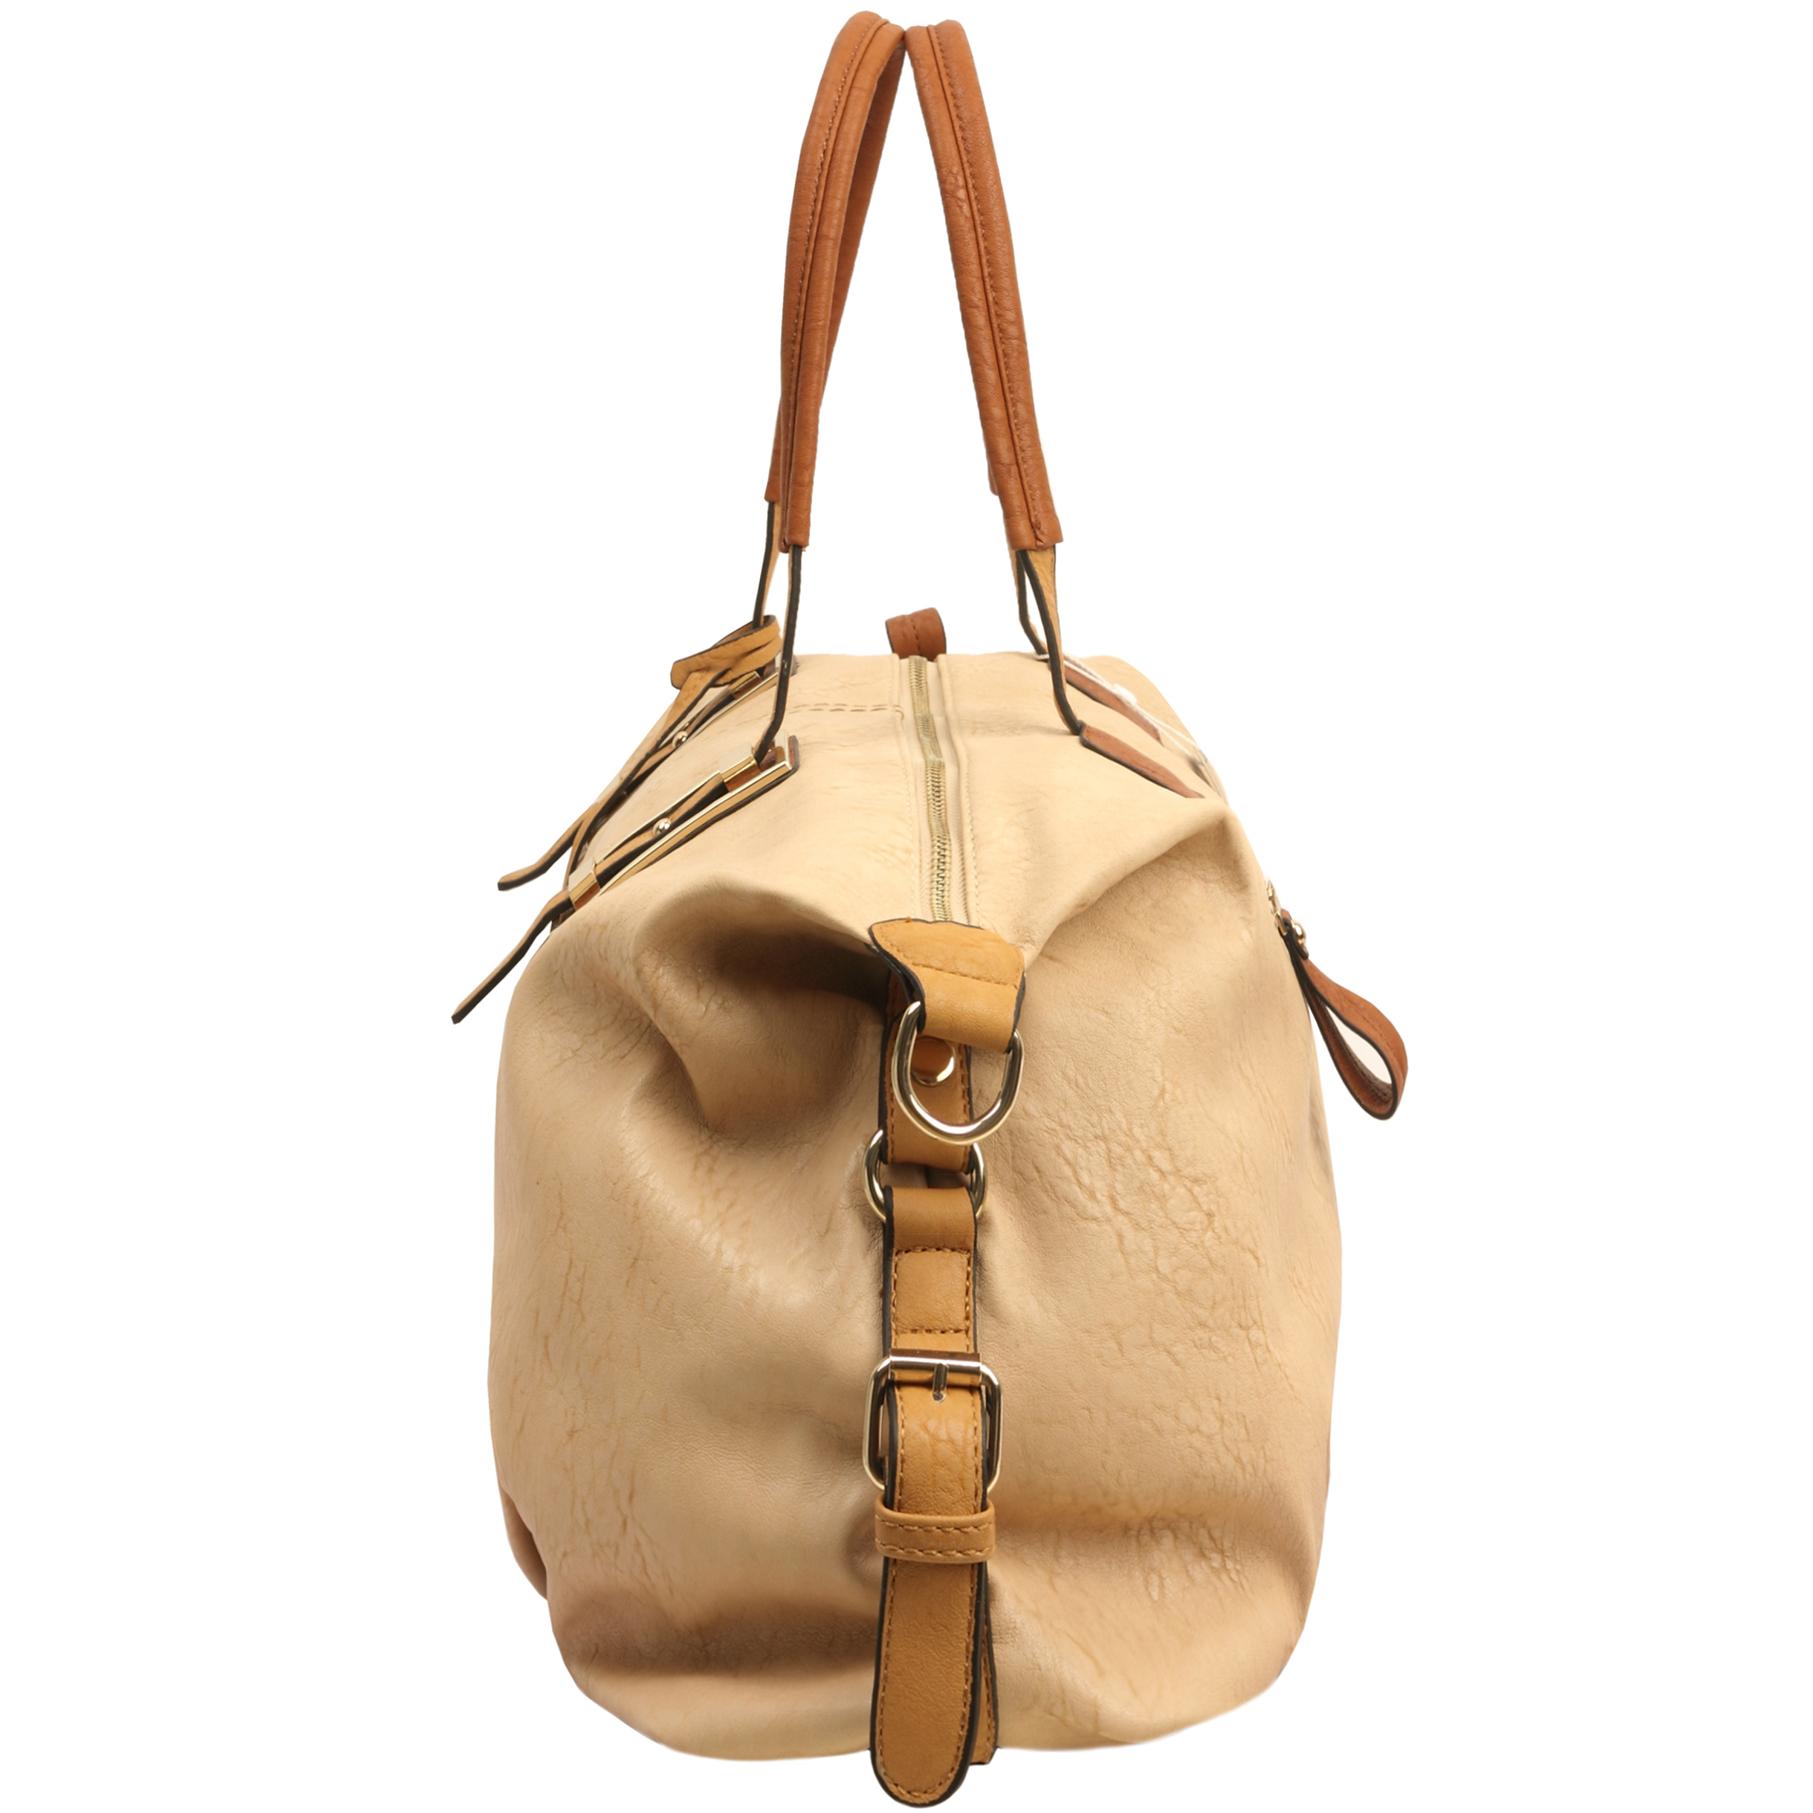 ACACIA Nude Large Everyday Shopper Hobo Handbag Side